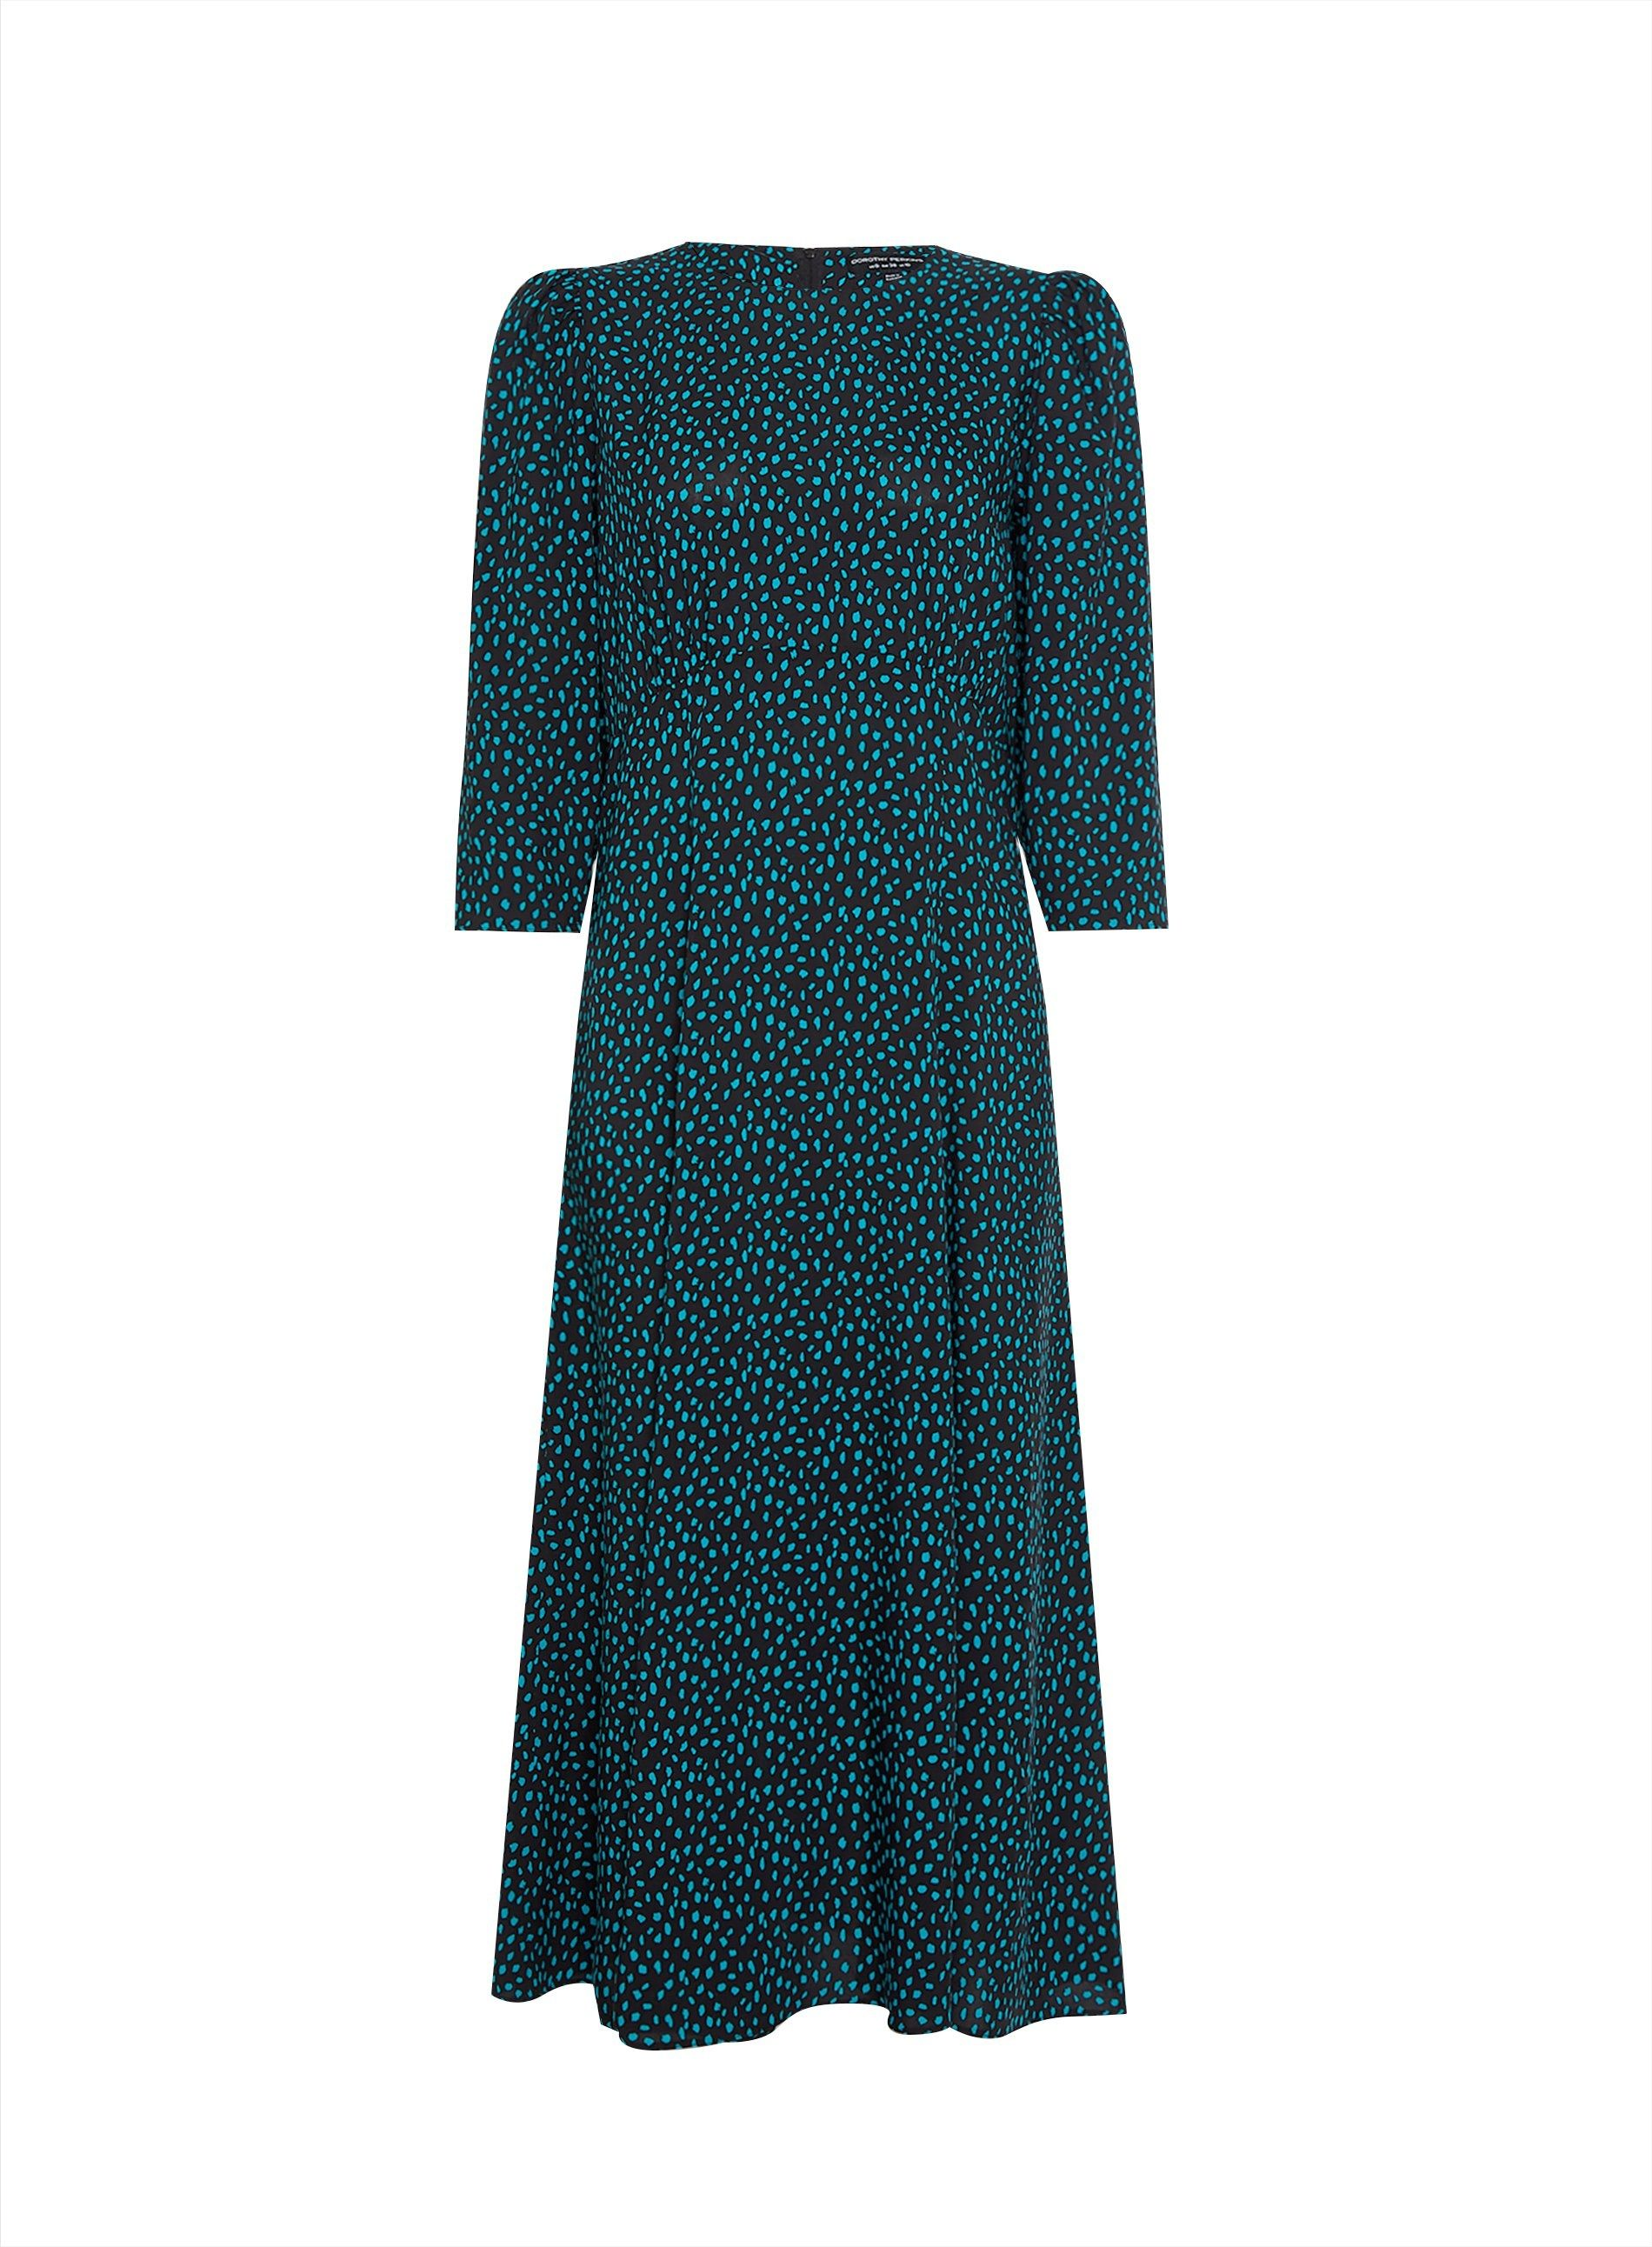 Dorothy Perkins Womens Green Spot Empire Midi Dress 3/4 Sleeve Round Neck